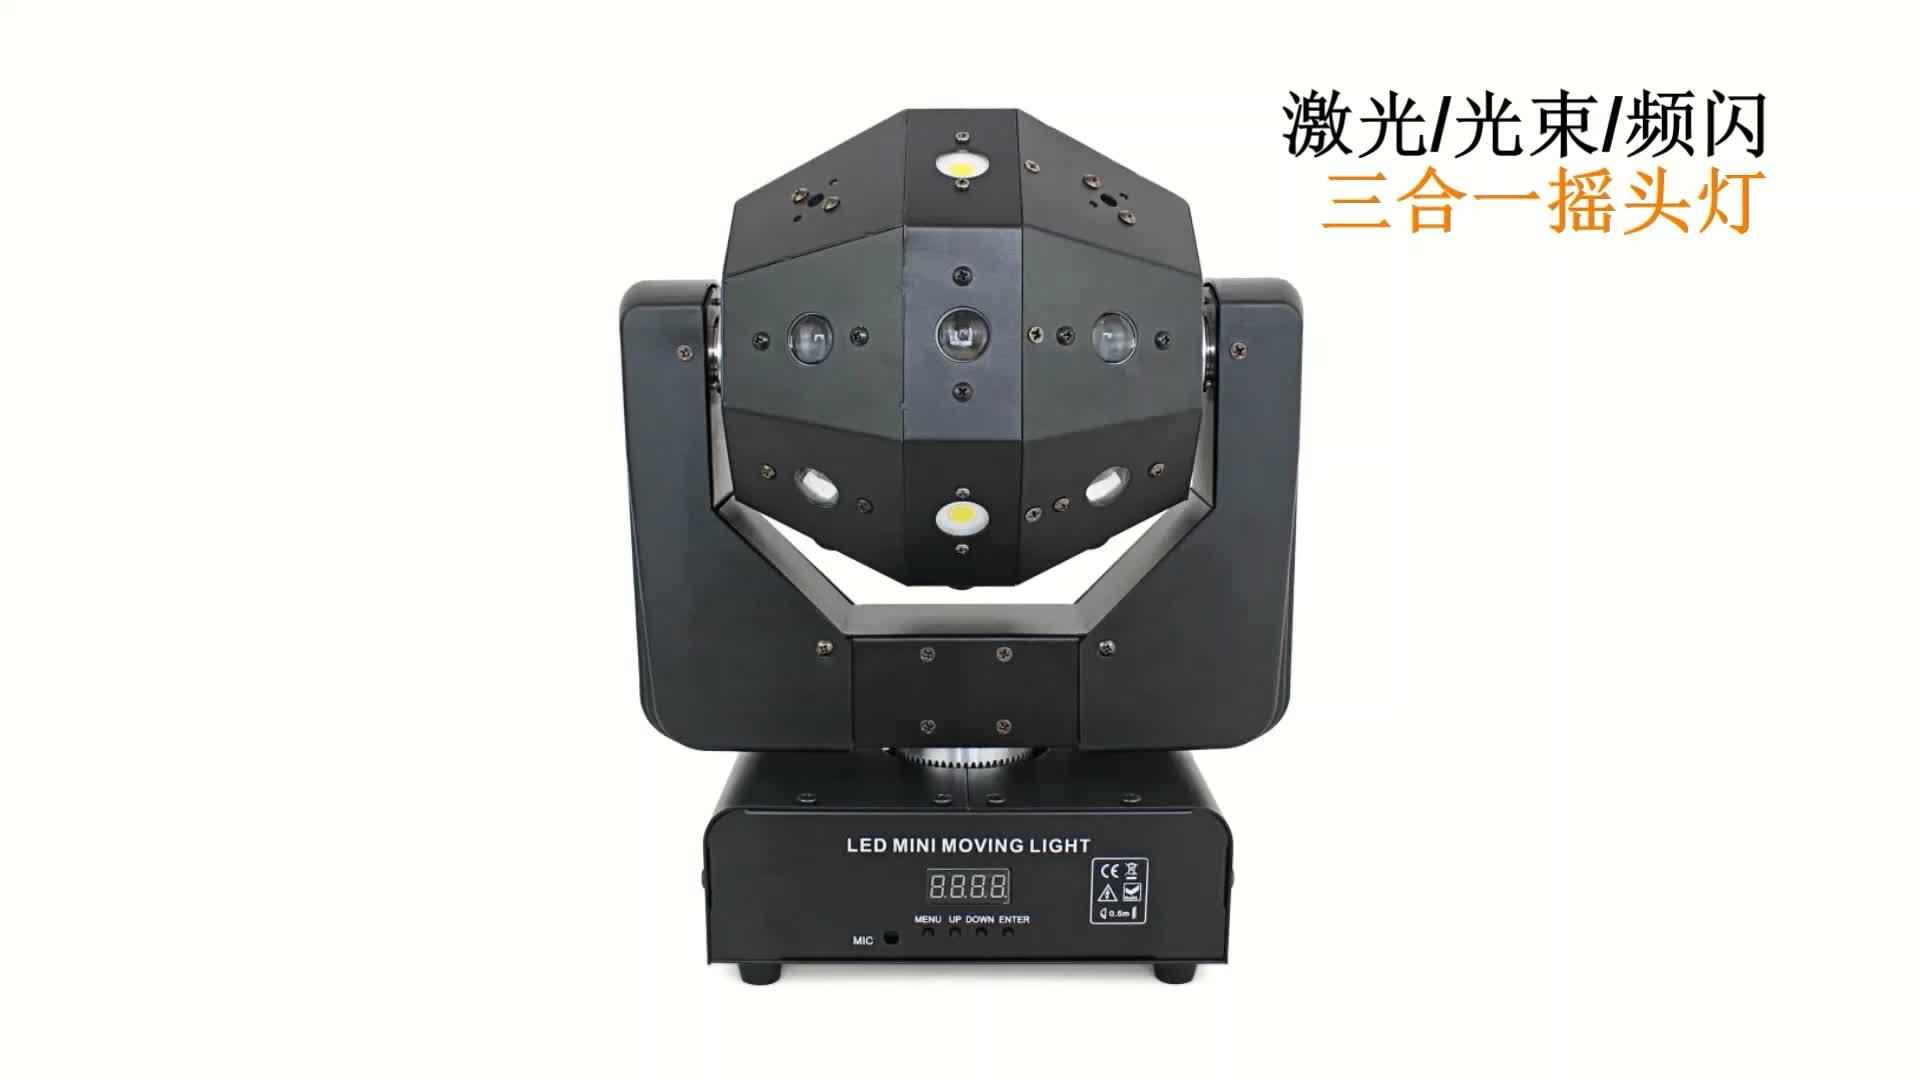 Bergerak kepala Balok Saku Lnno lihjt Baru Laser Strobe 3in1 RGBW LED untuk DJ Lighting Disco tahap Cahaya